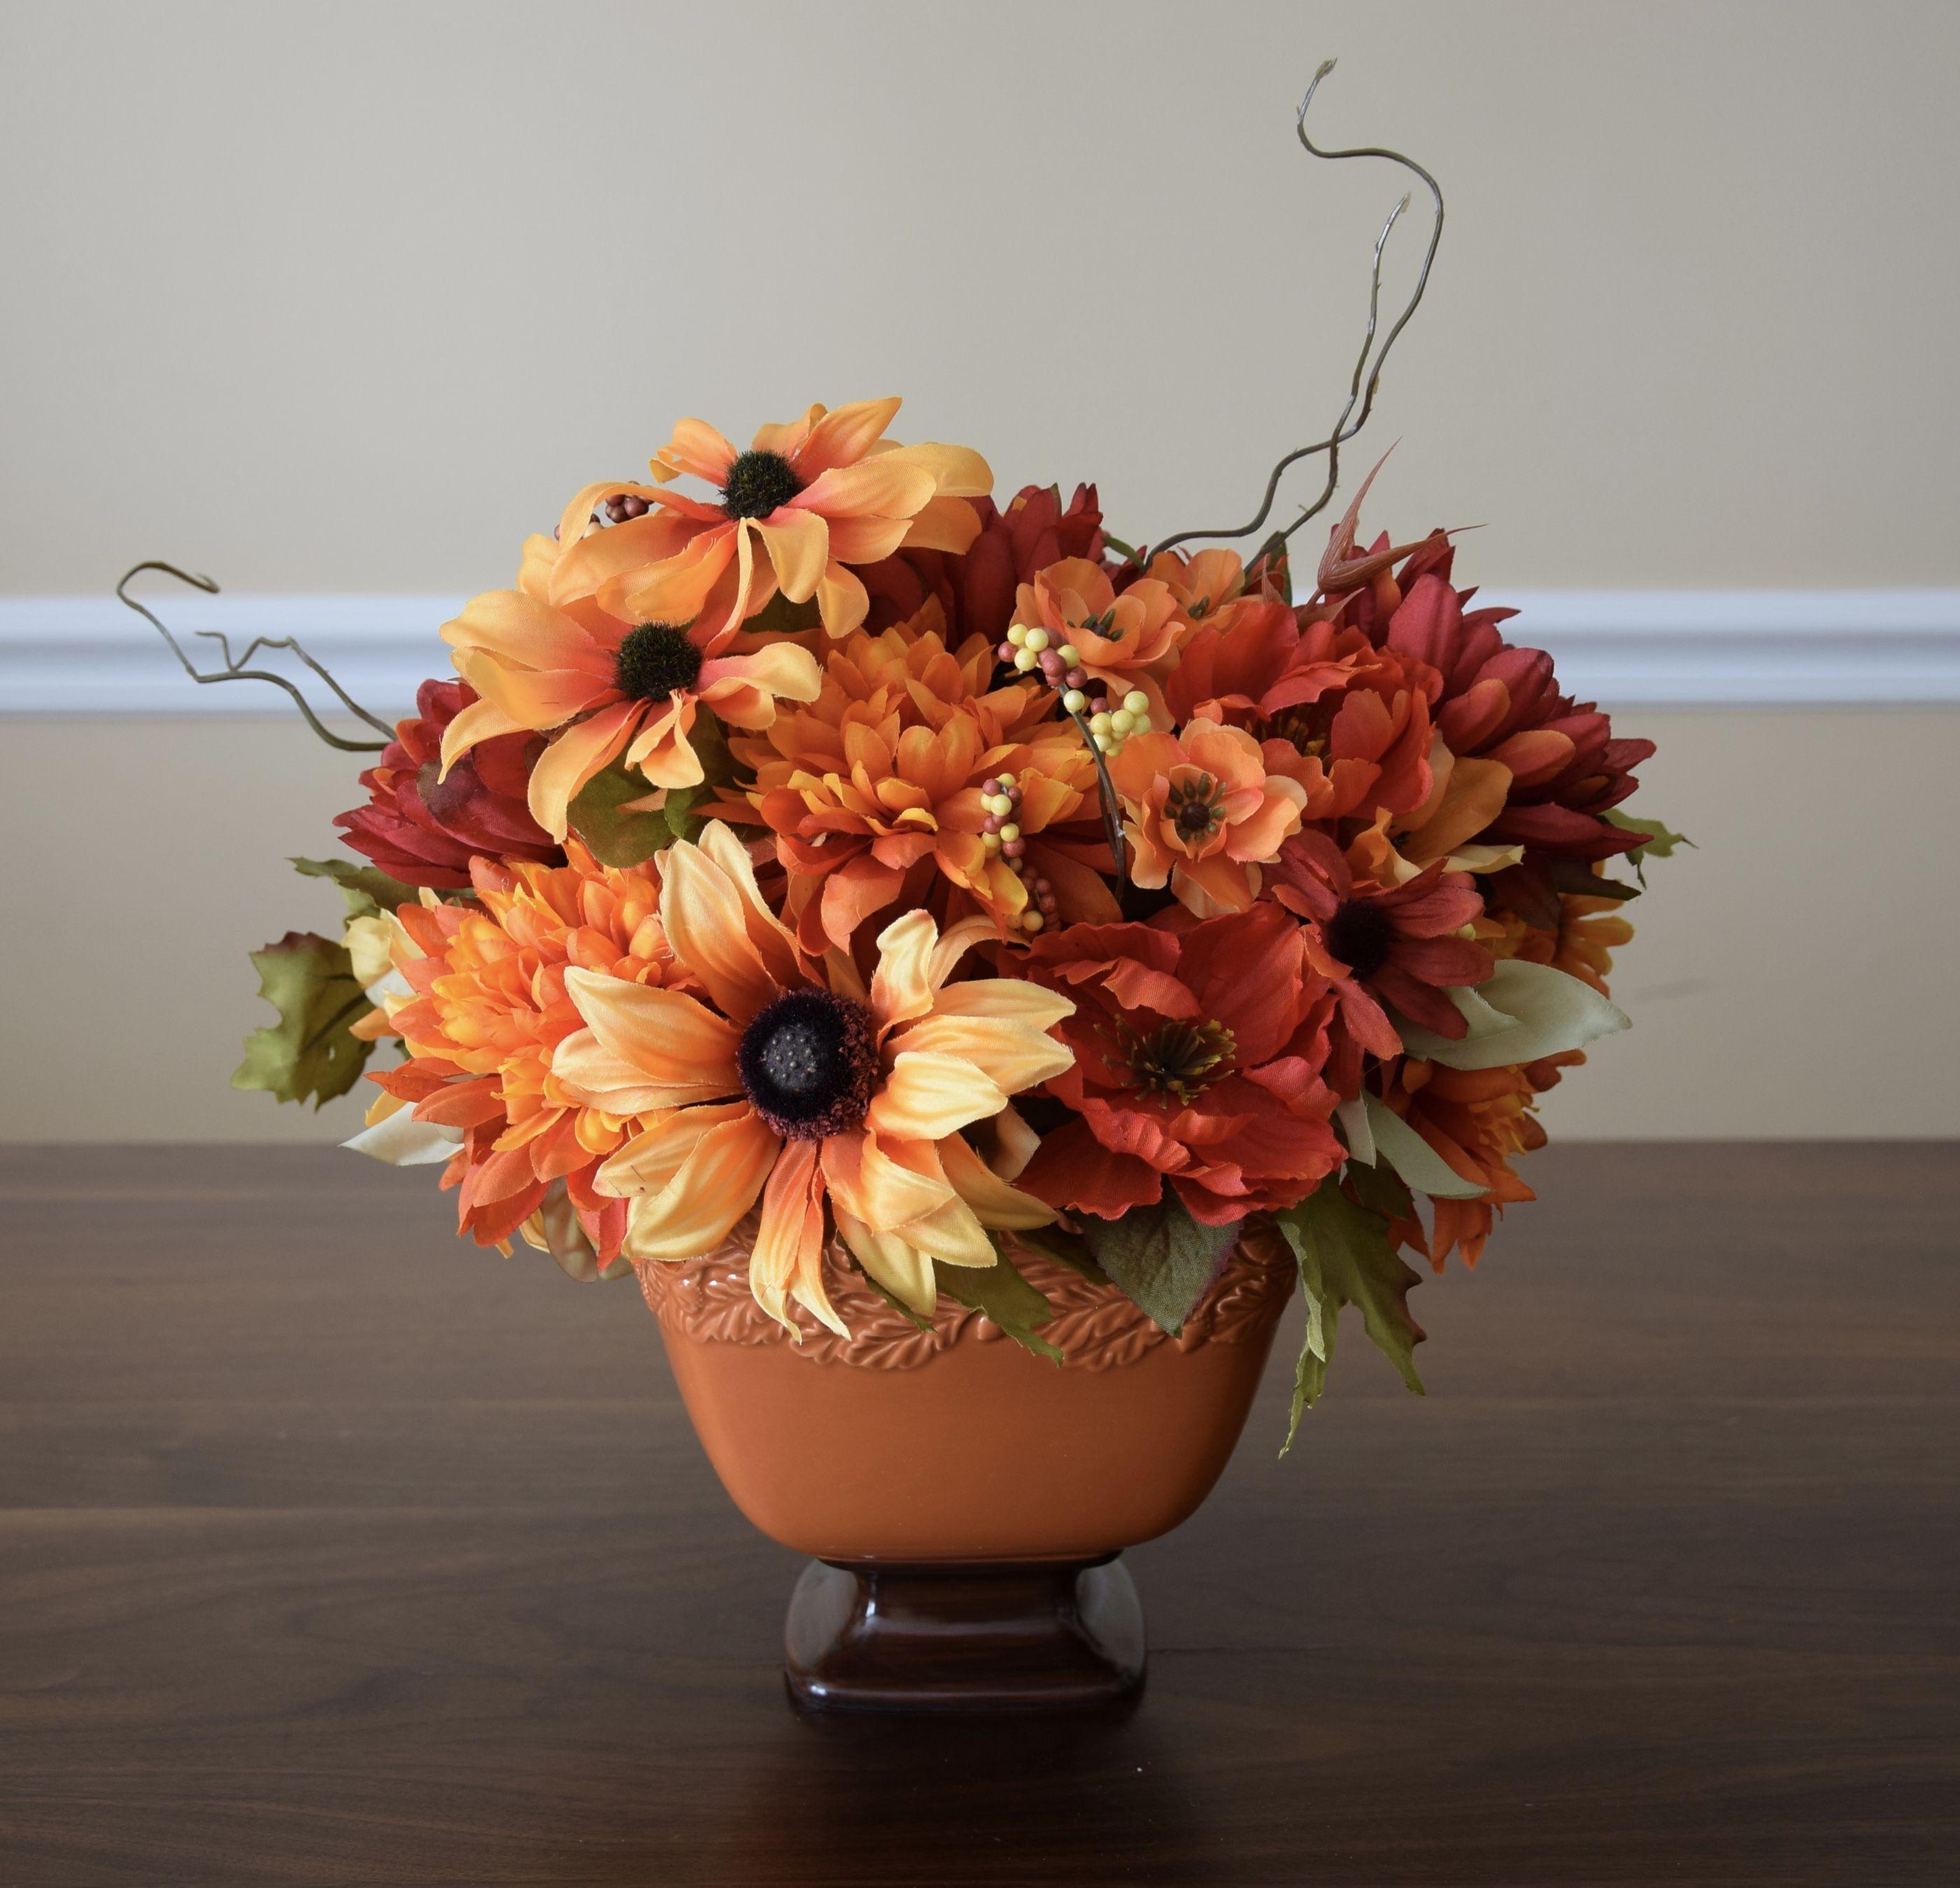 Flower Arrangement Made With Silk Flowers Autumn Colors High